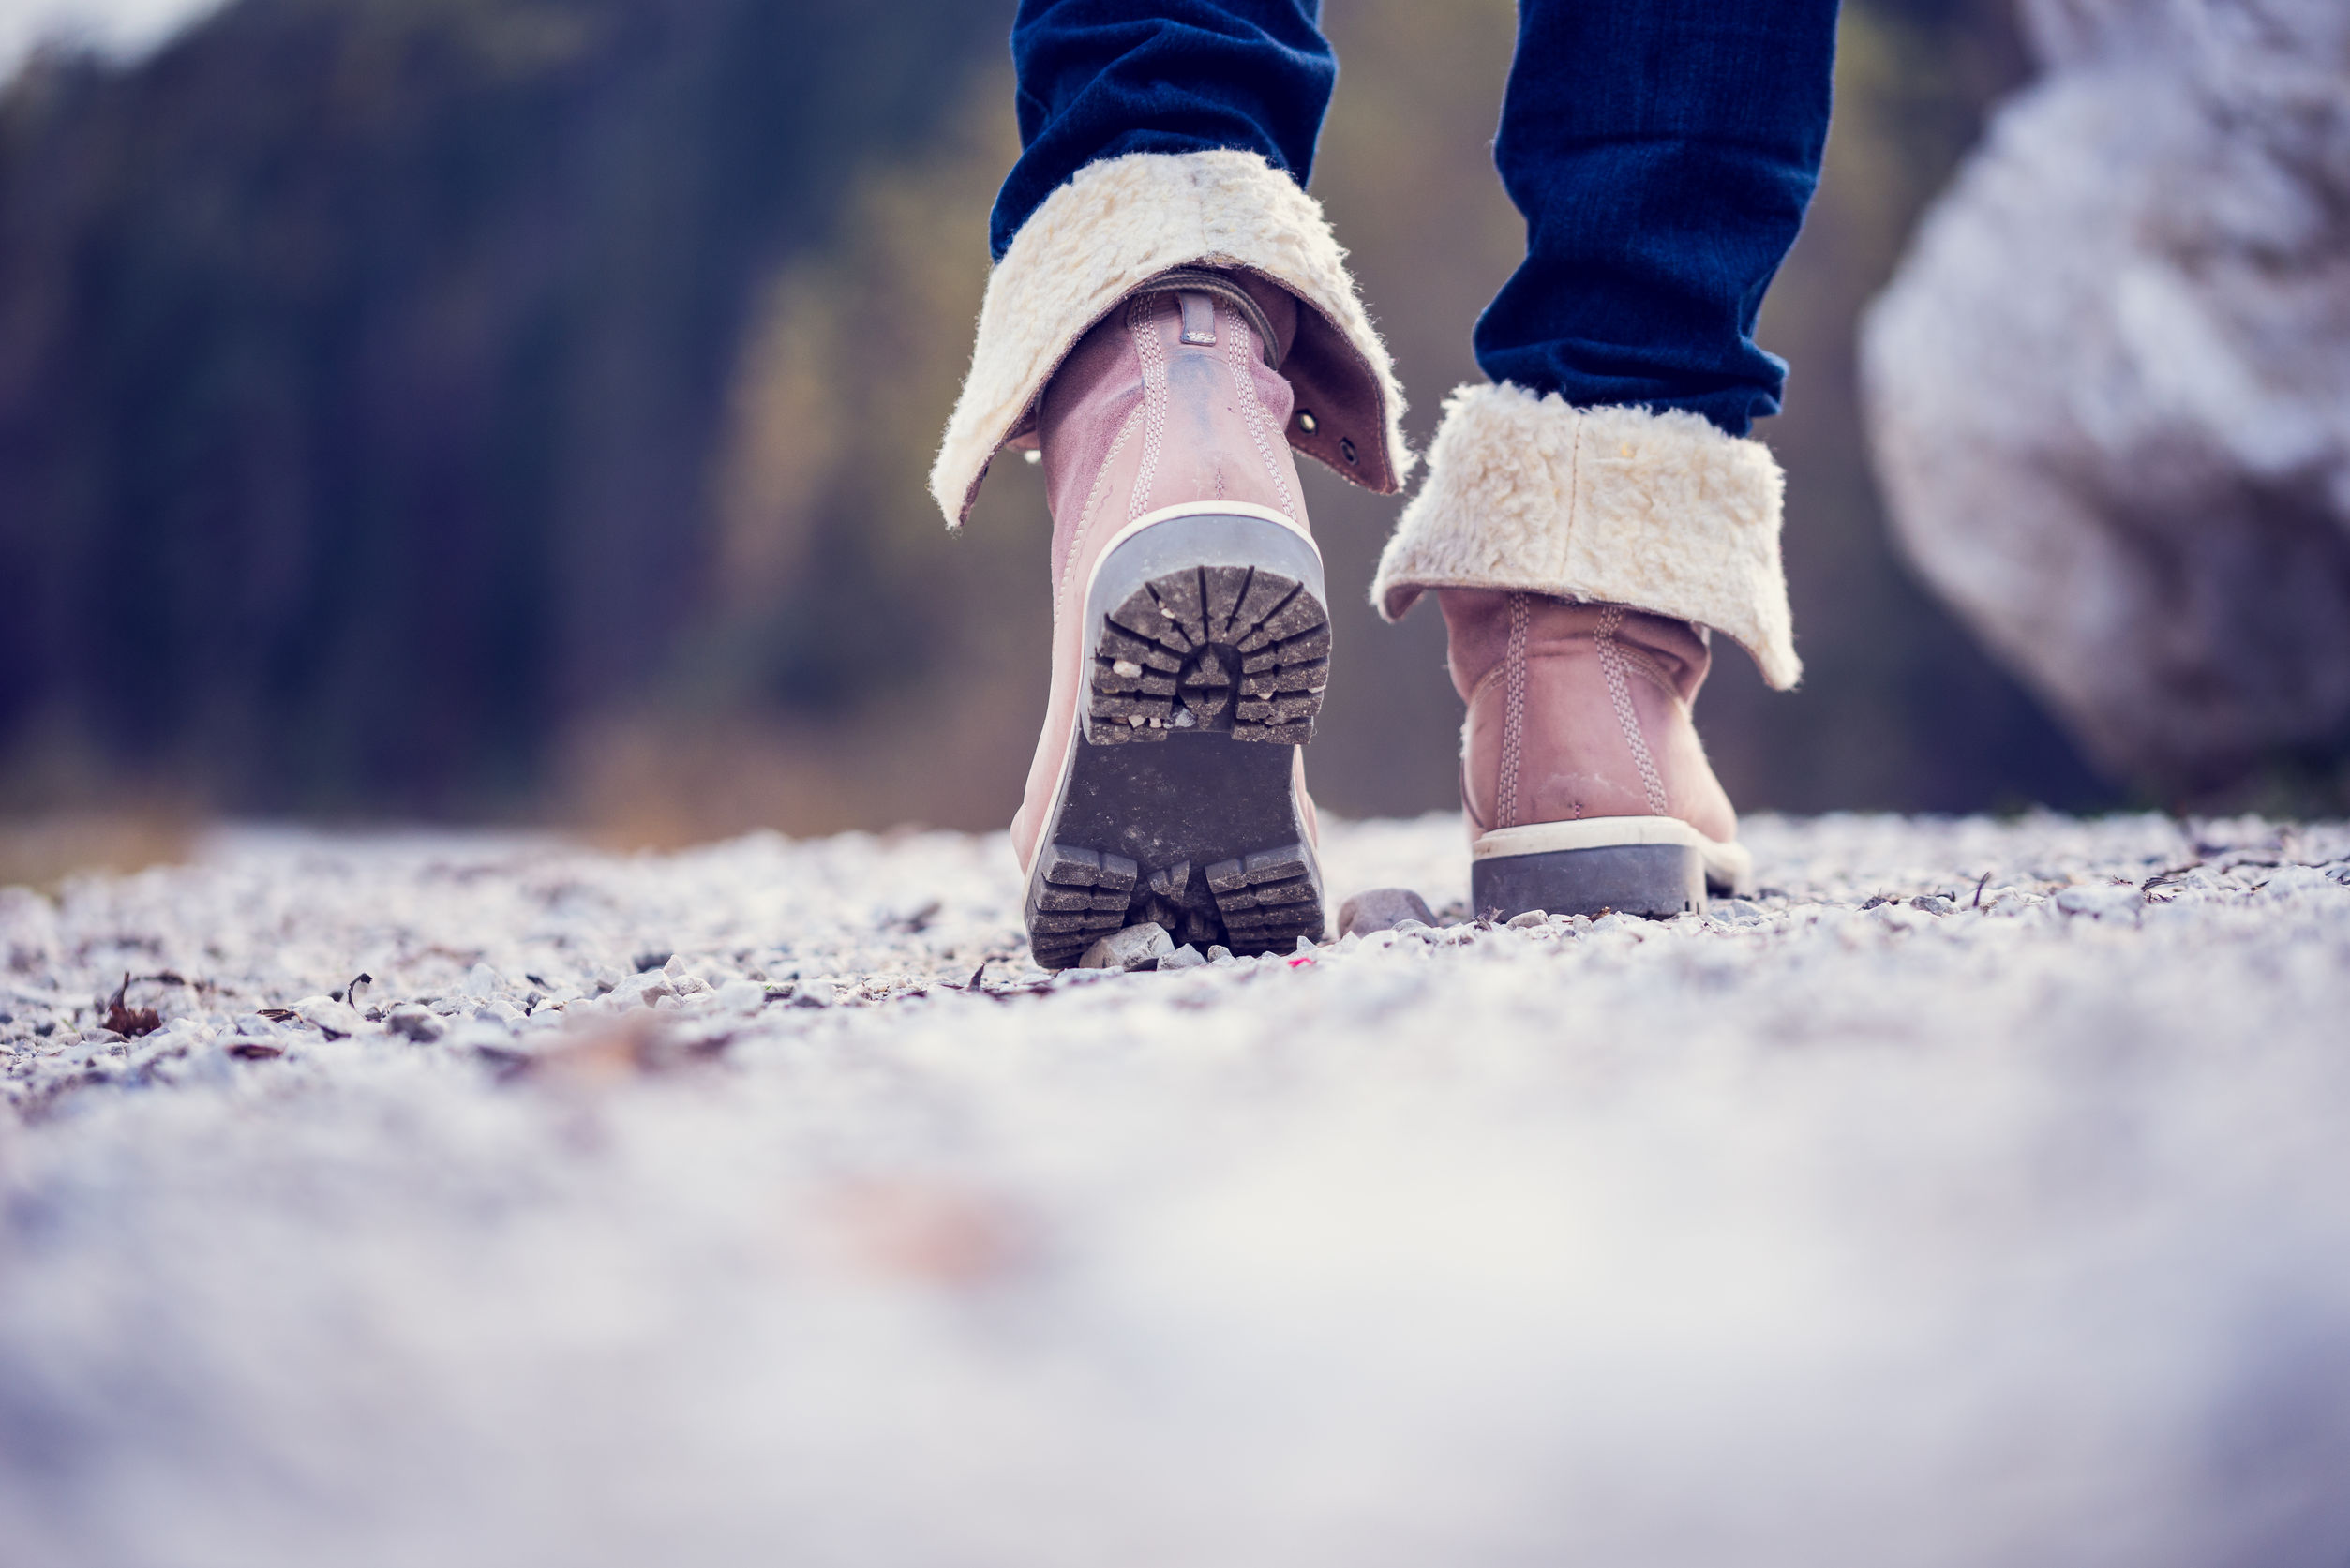 walkinglent